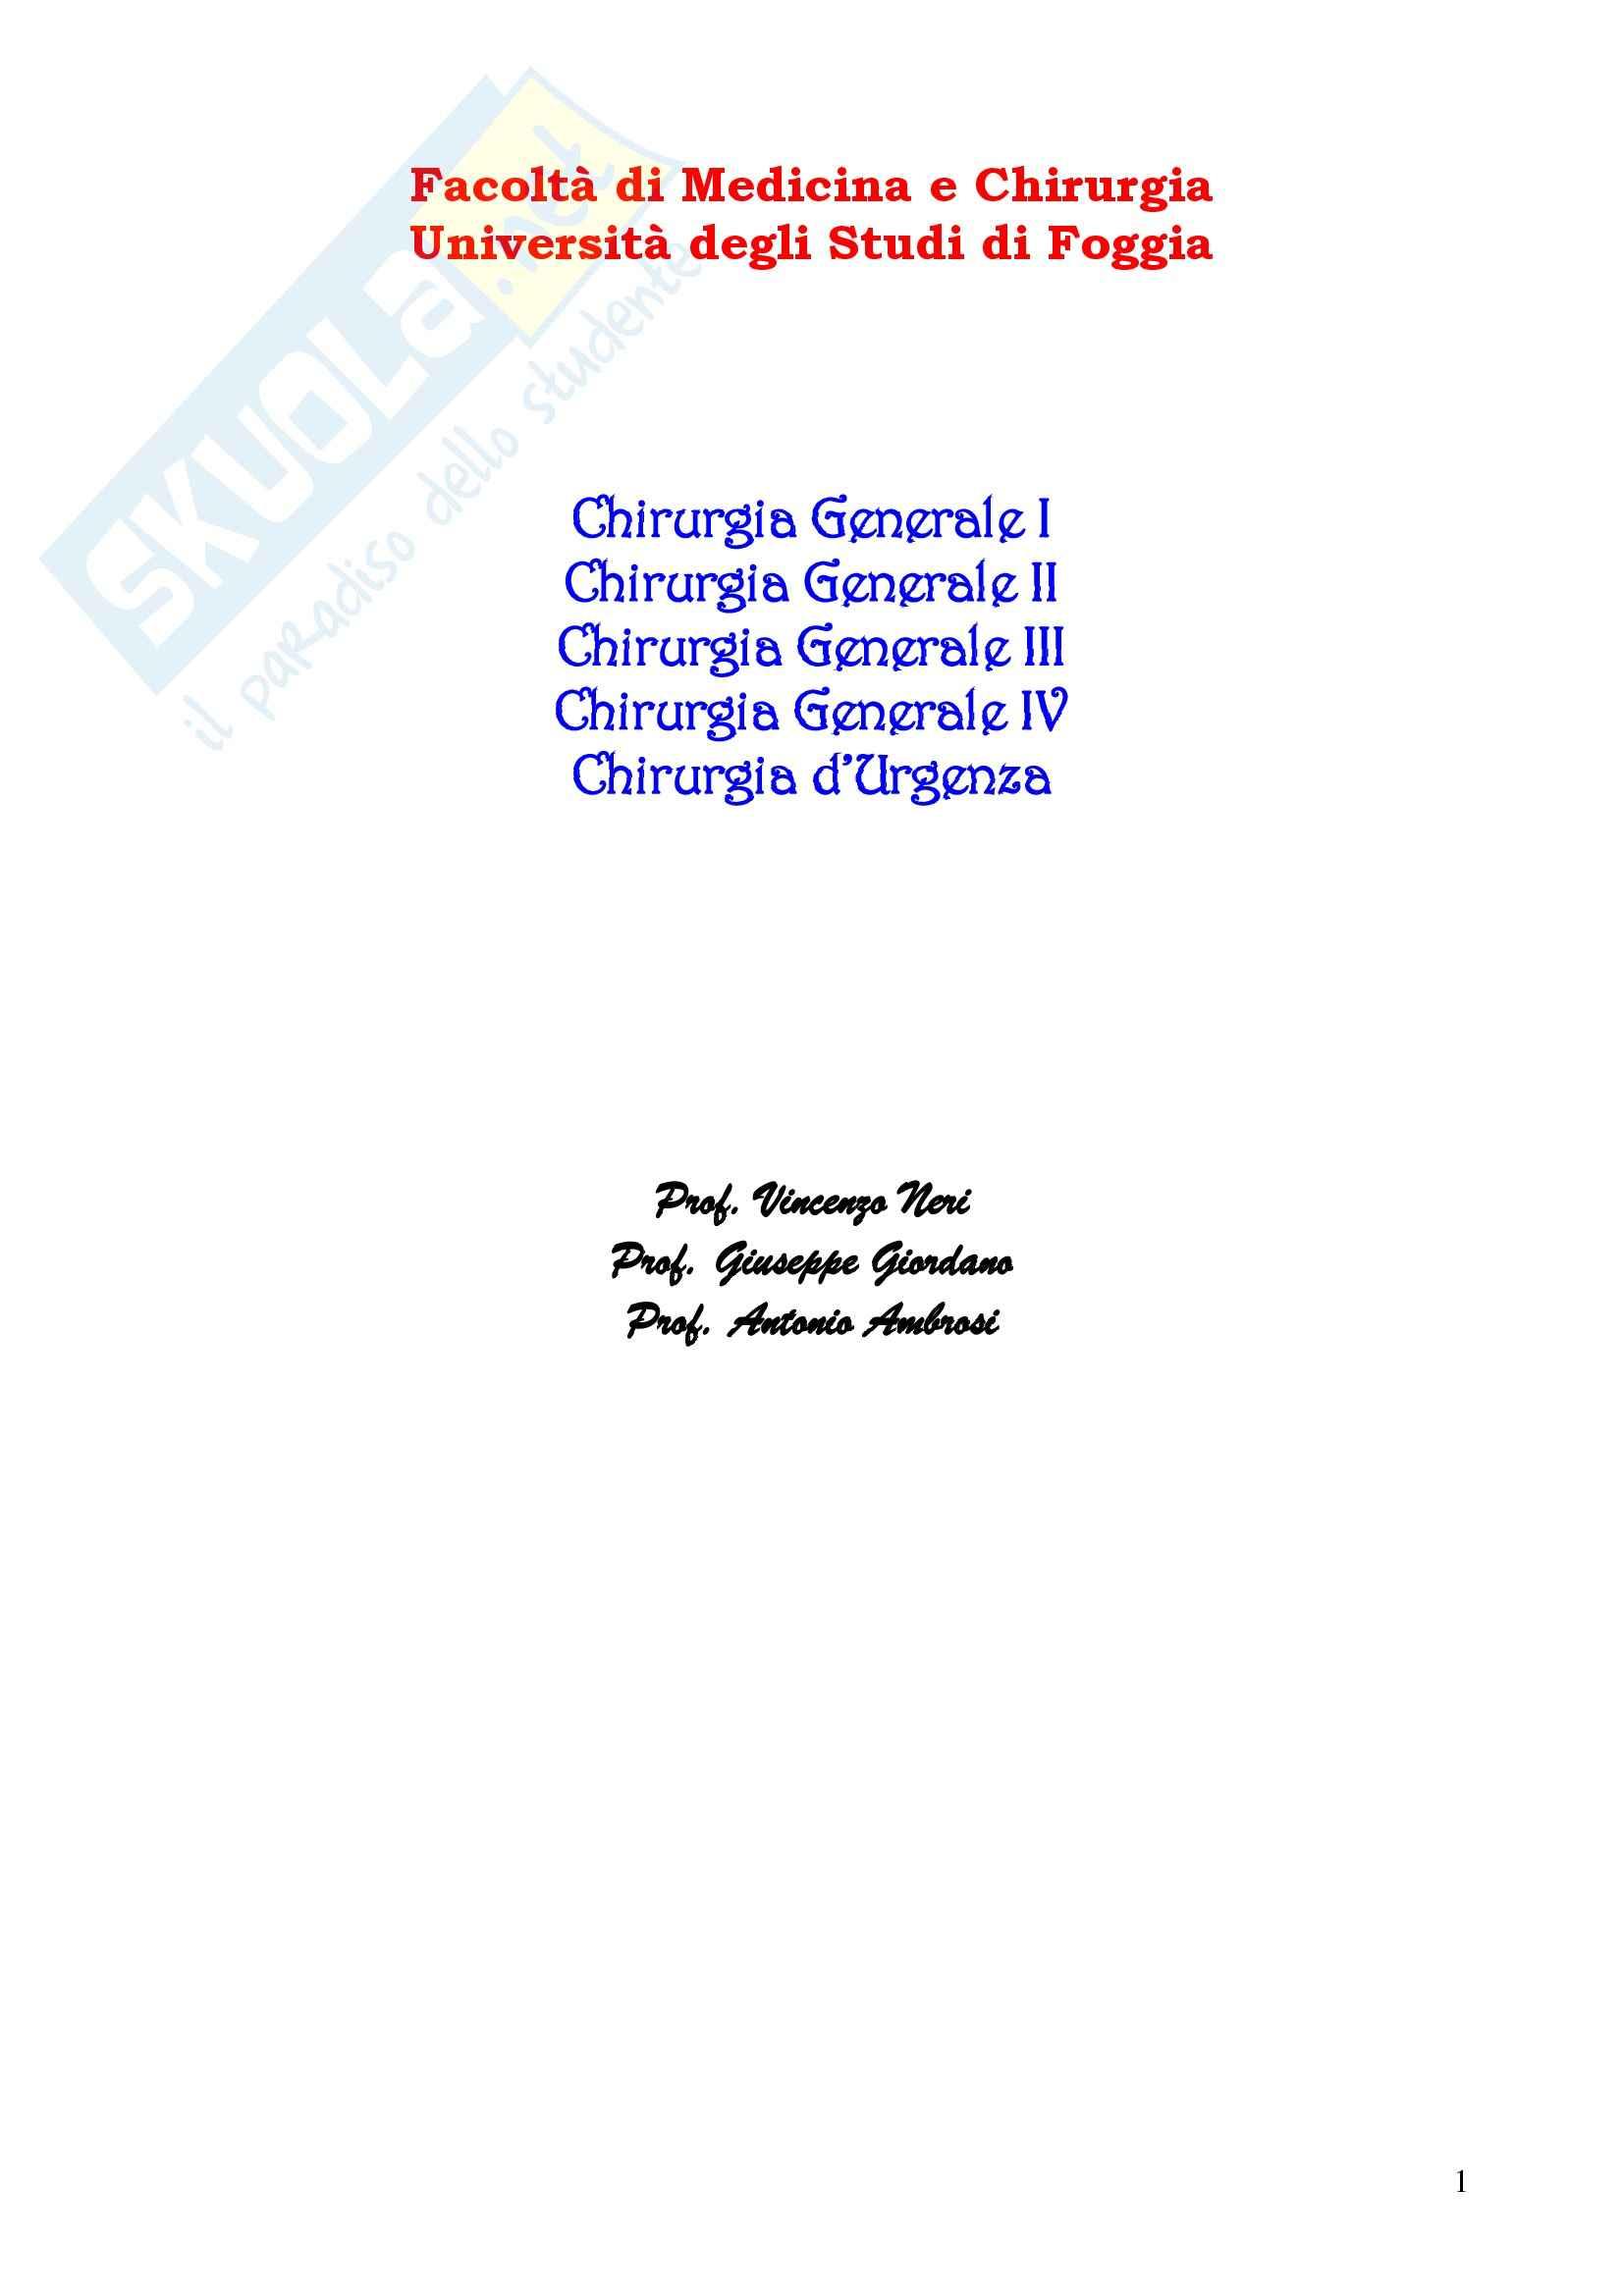 Chirurgia - chirurgia generale - Appunti